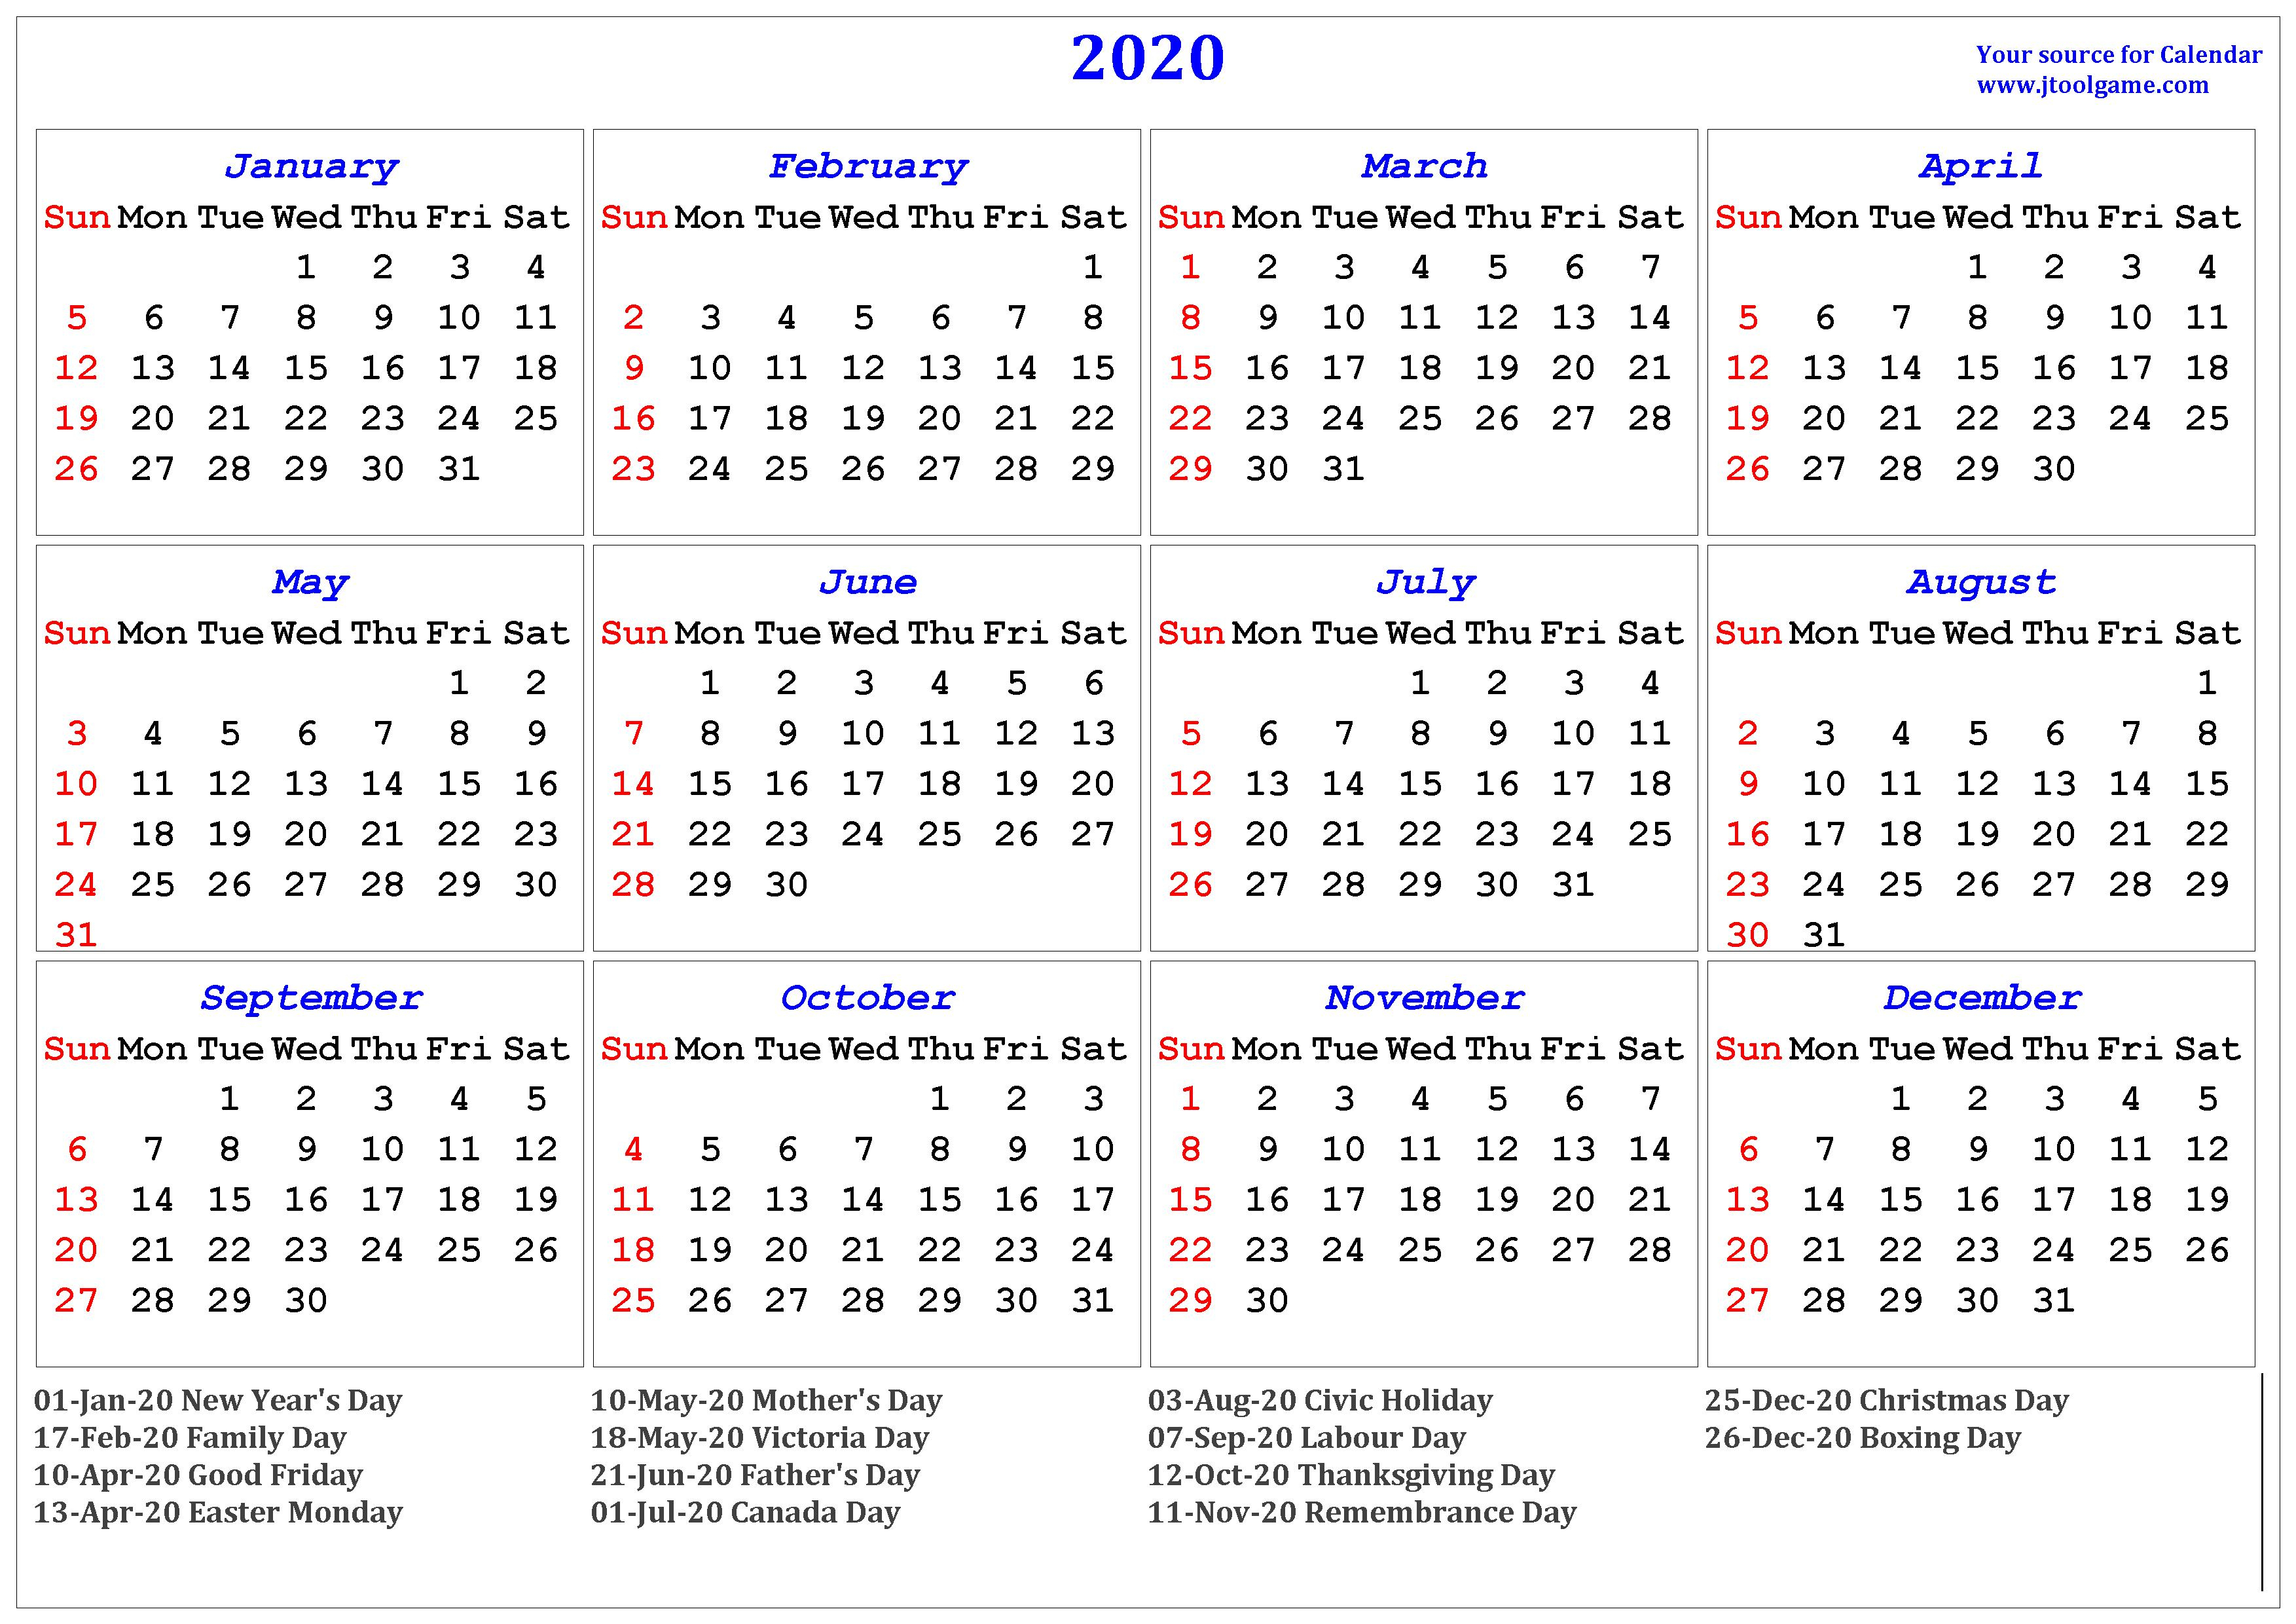 2020 Calendar - Printable Calendar. 2020 Calendar In regarding Free Printable 2020 Canadian Calendar